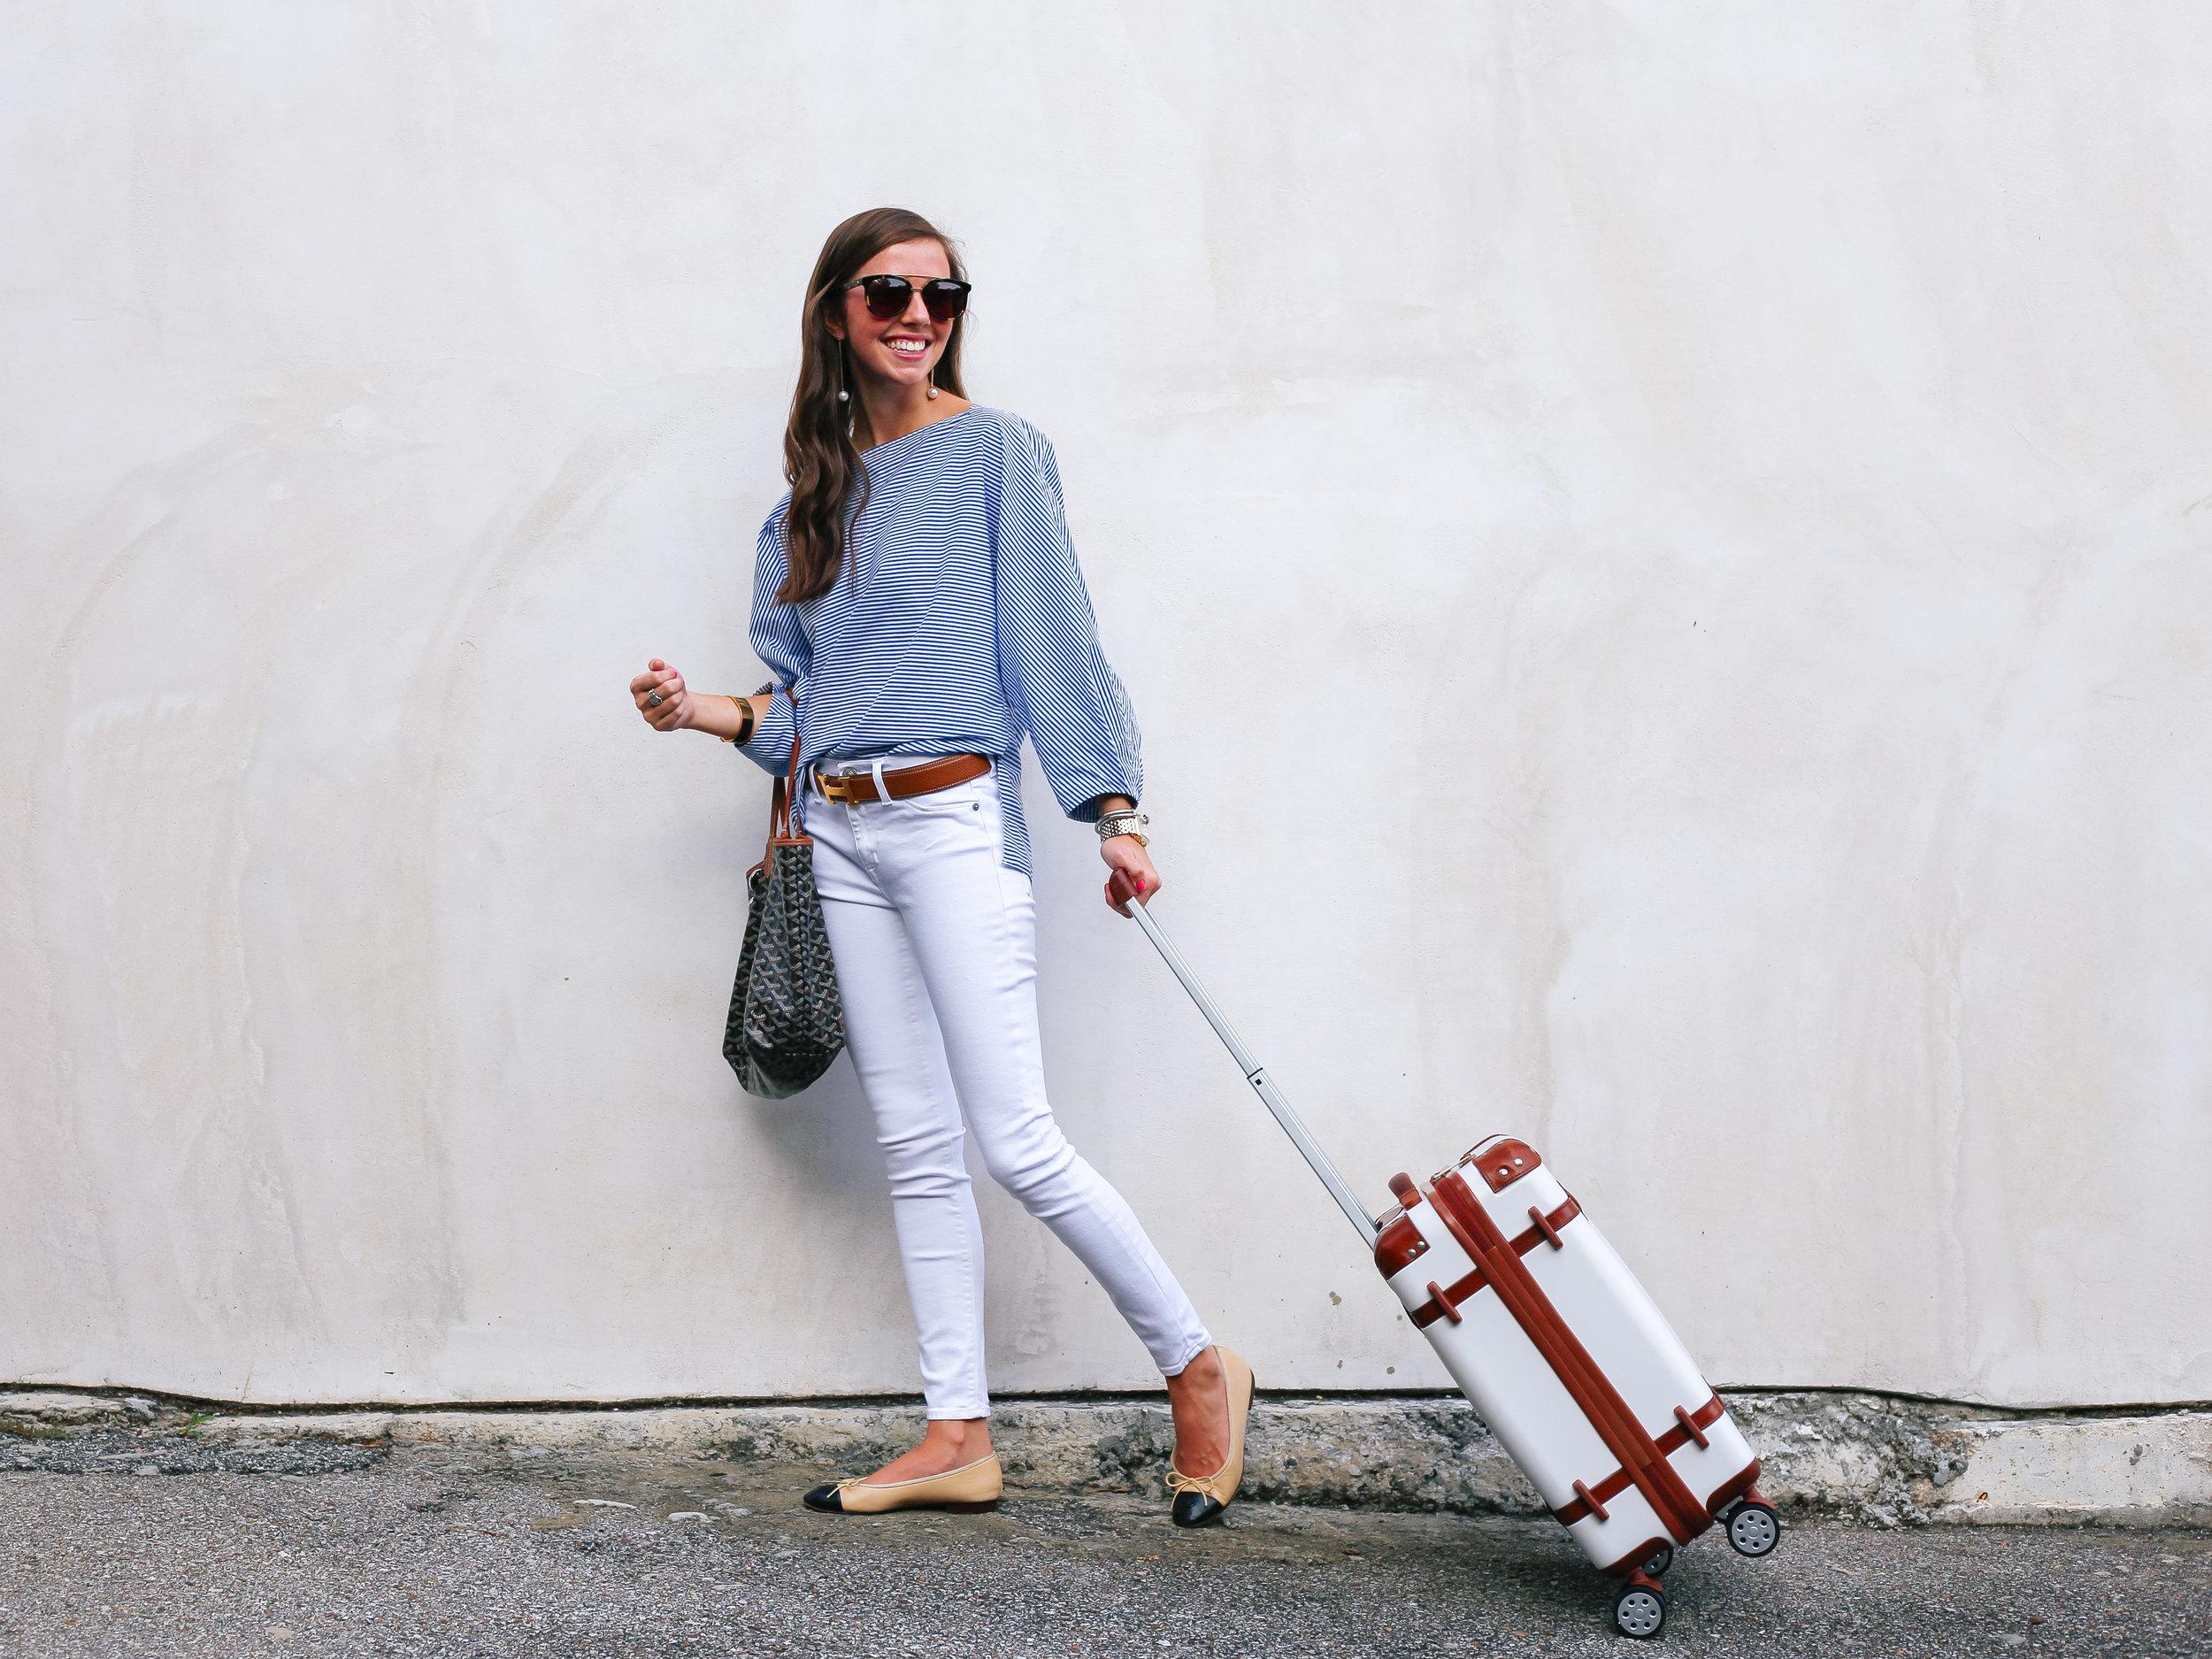 fashion blogger lcb style travel carry on mark and graham goyard tibi chanel flats (21 of 31).jpg